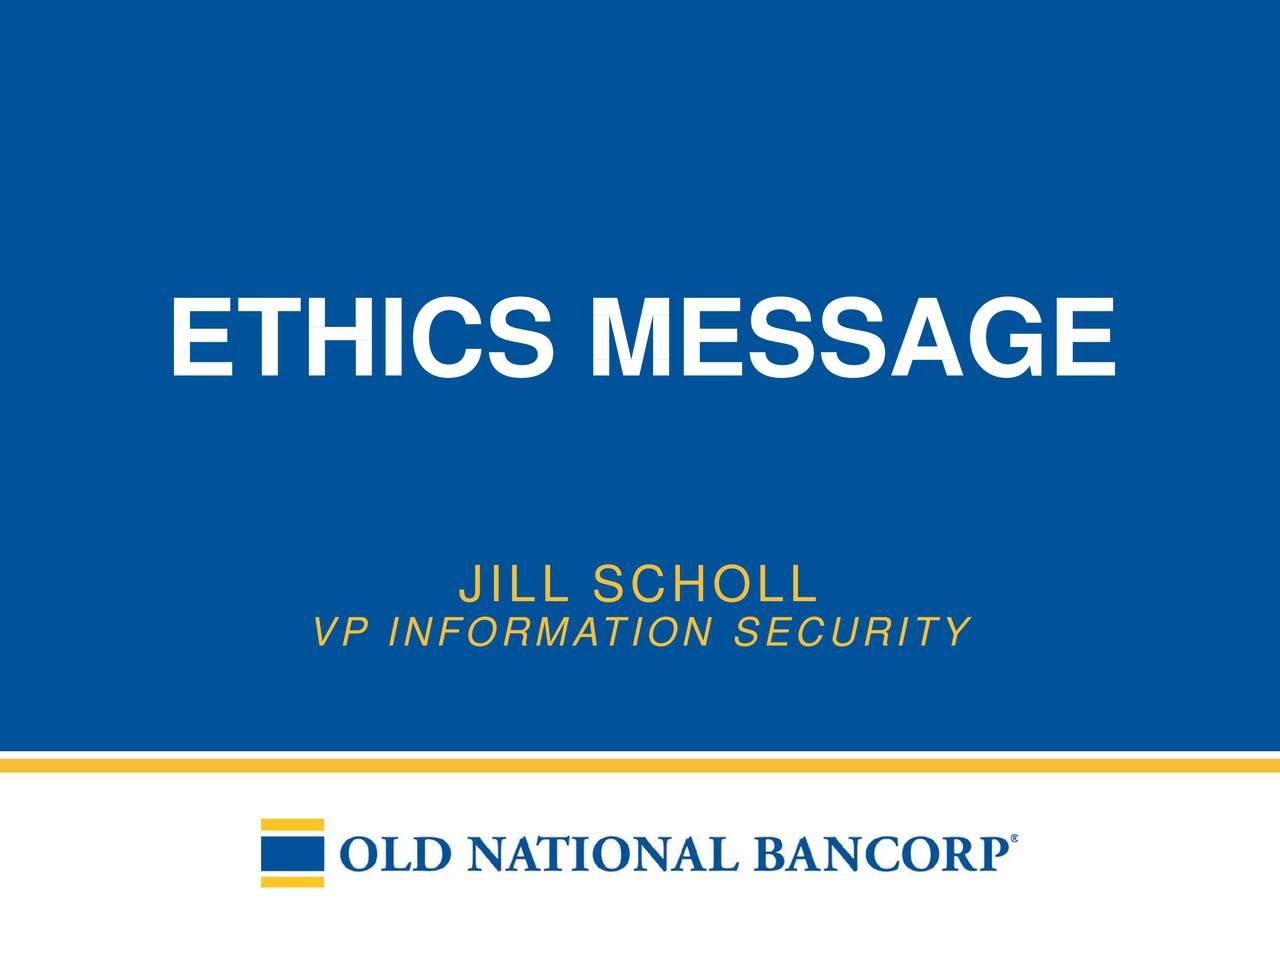 JILL SCHOLL VP INFORMATION SECURITY